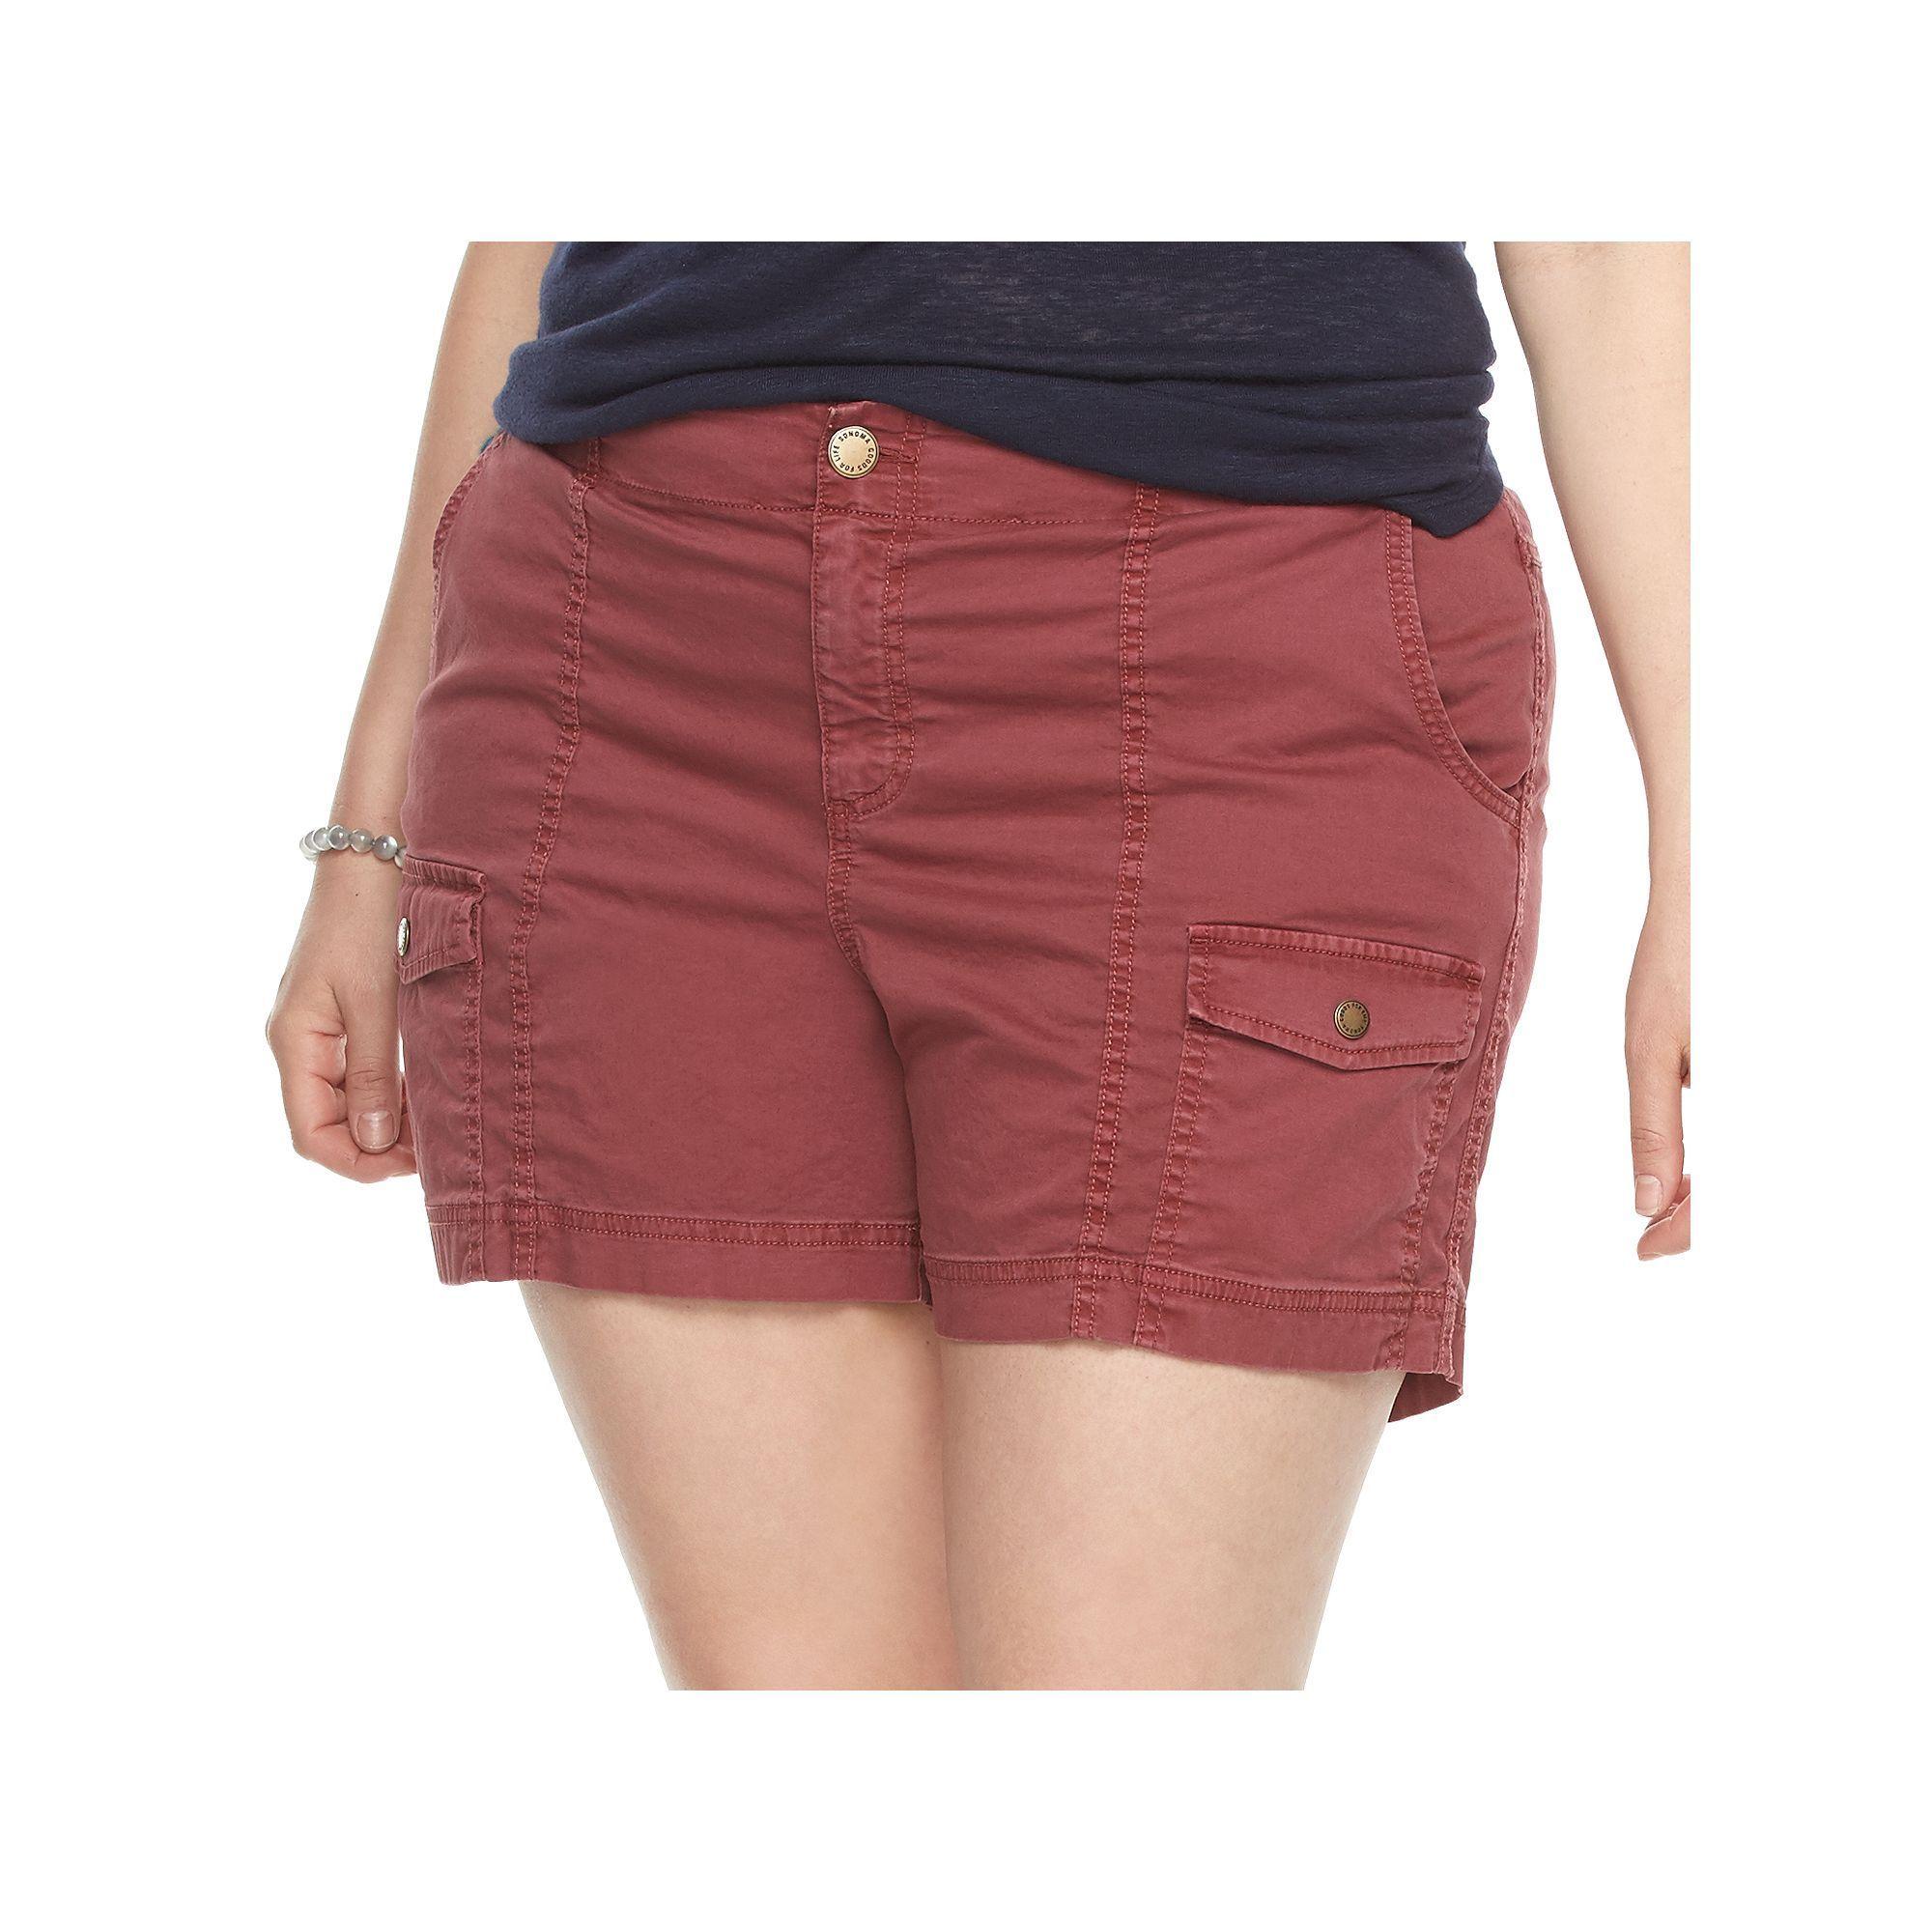 Plus size sonoma goods for lifeâue comfort waist cargo shorts